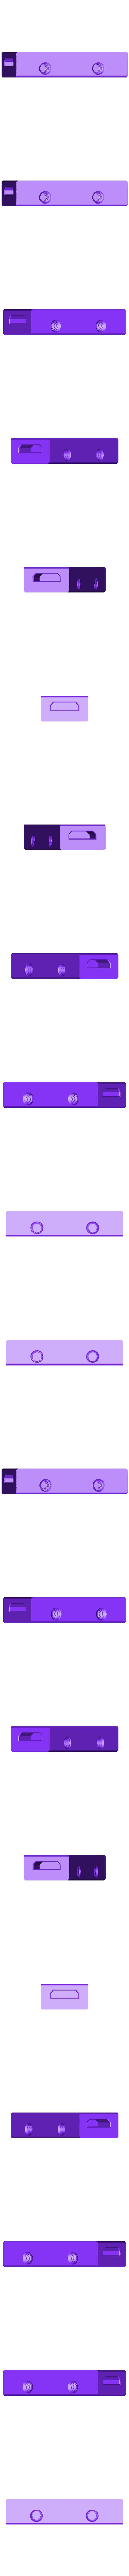 tanker_chassis_bottom.stl Download STL file Toy train construction set - whole train combo • 3D print object, kozakm